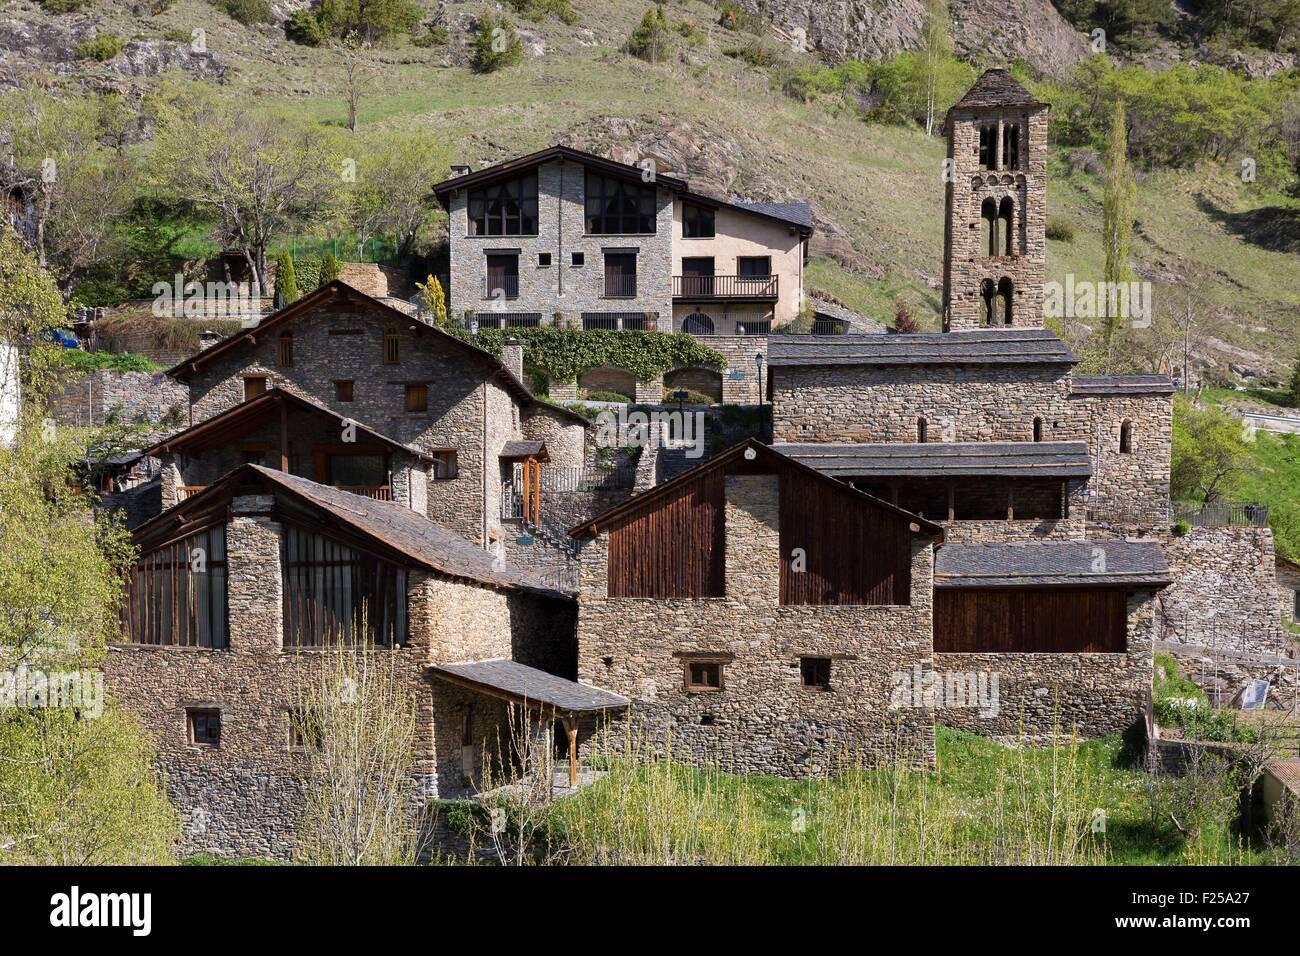 Andorra, Pal village, Sant Climent church - Stock Image